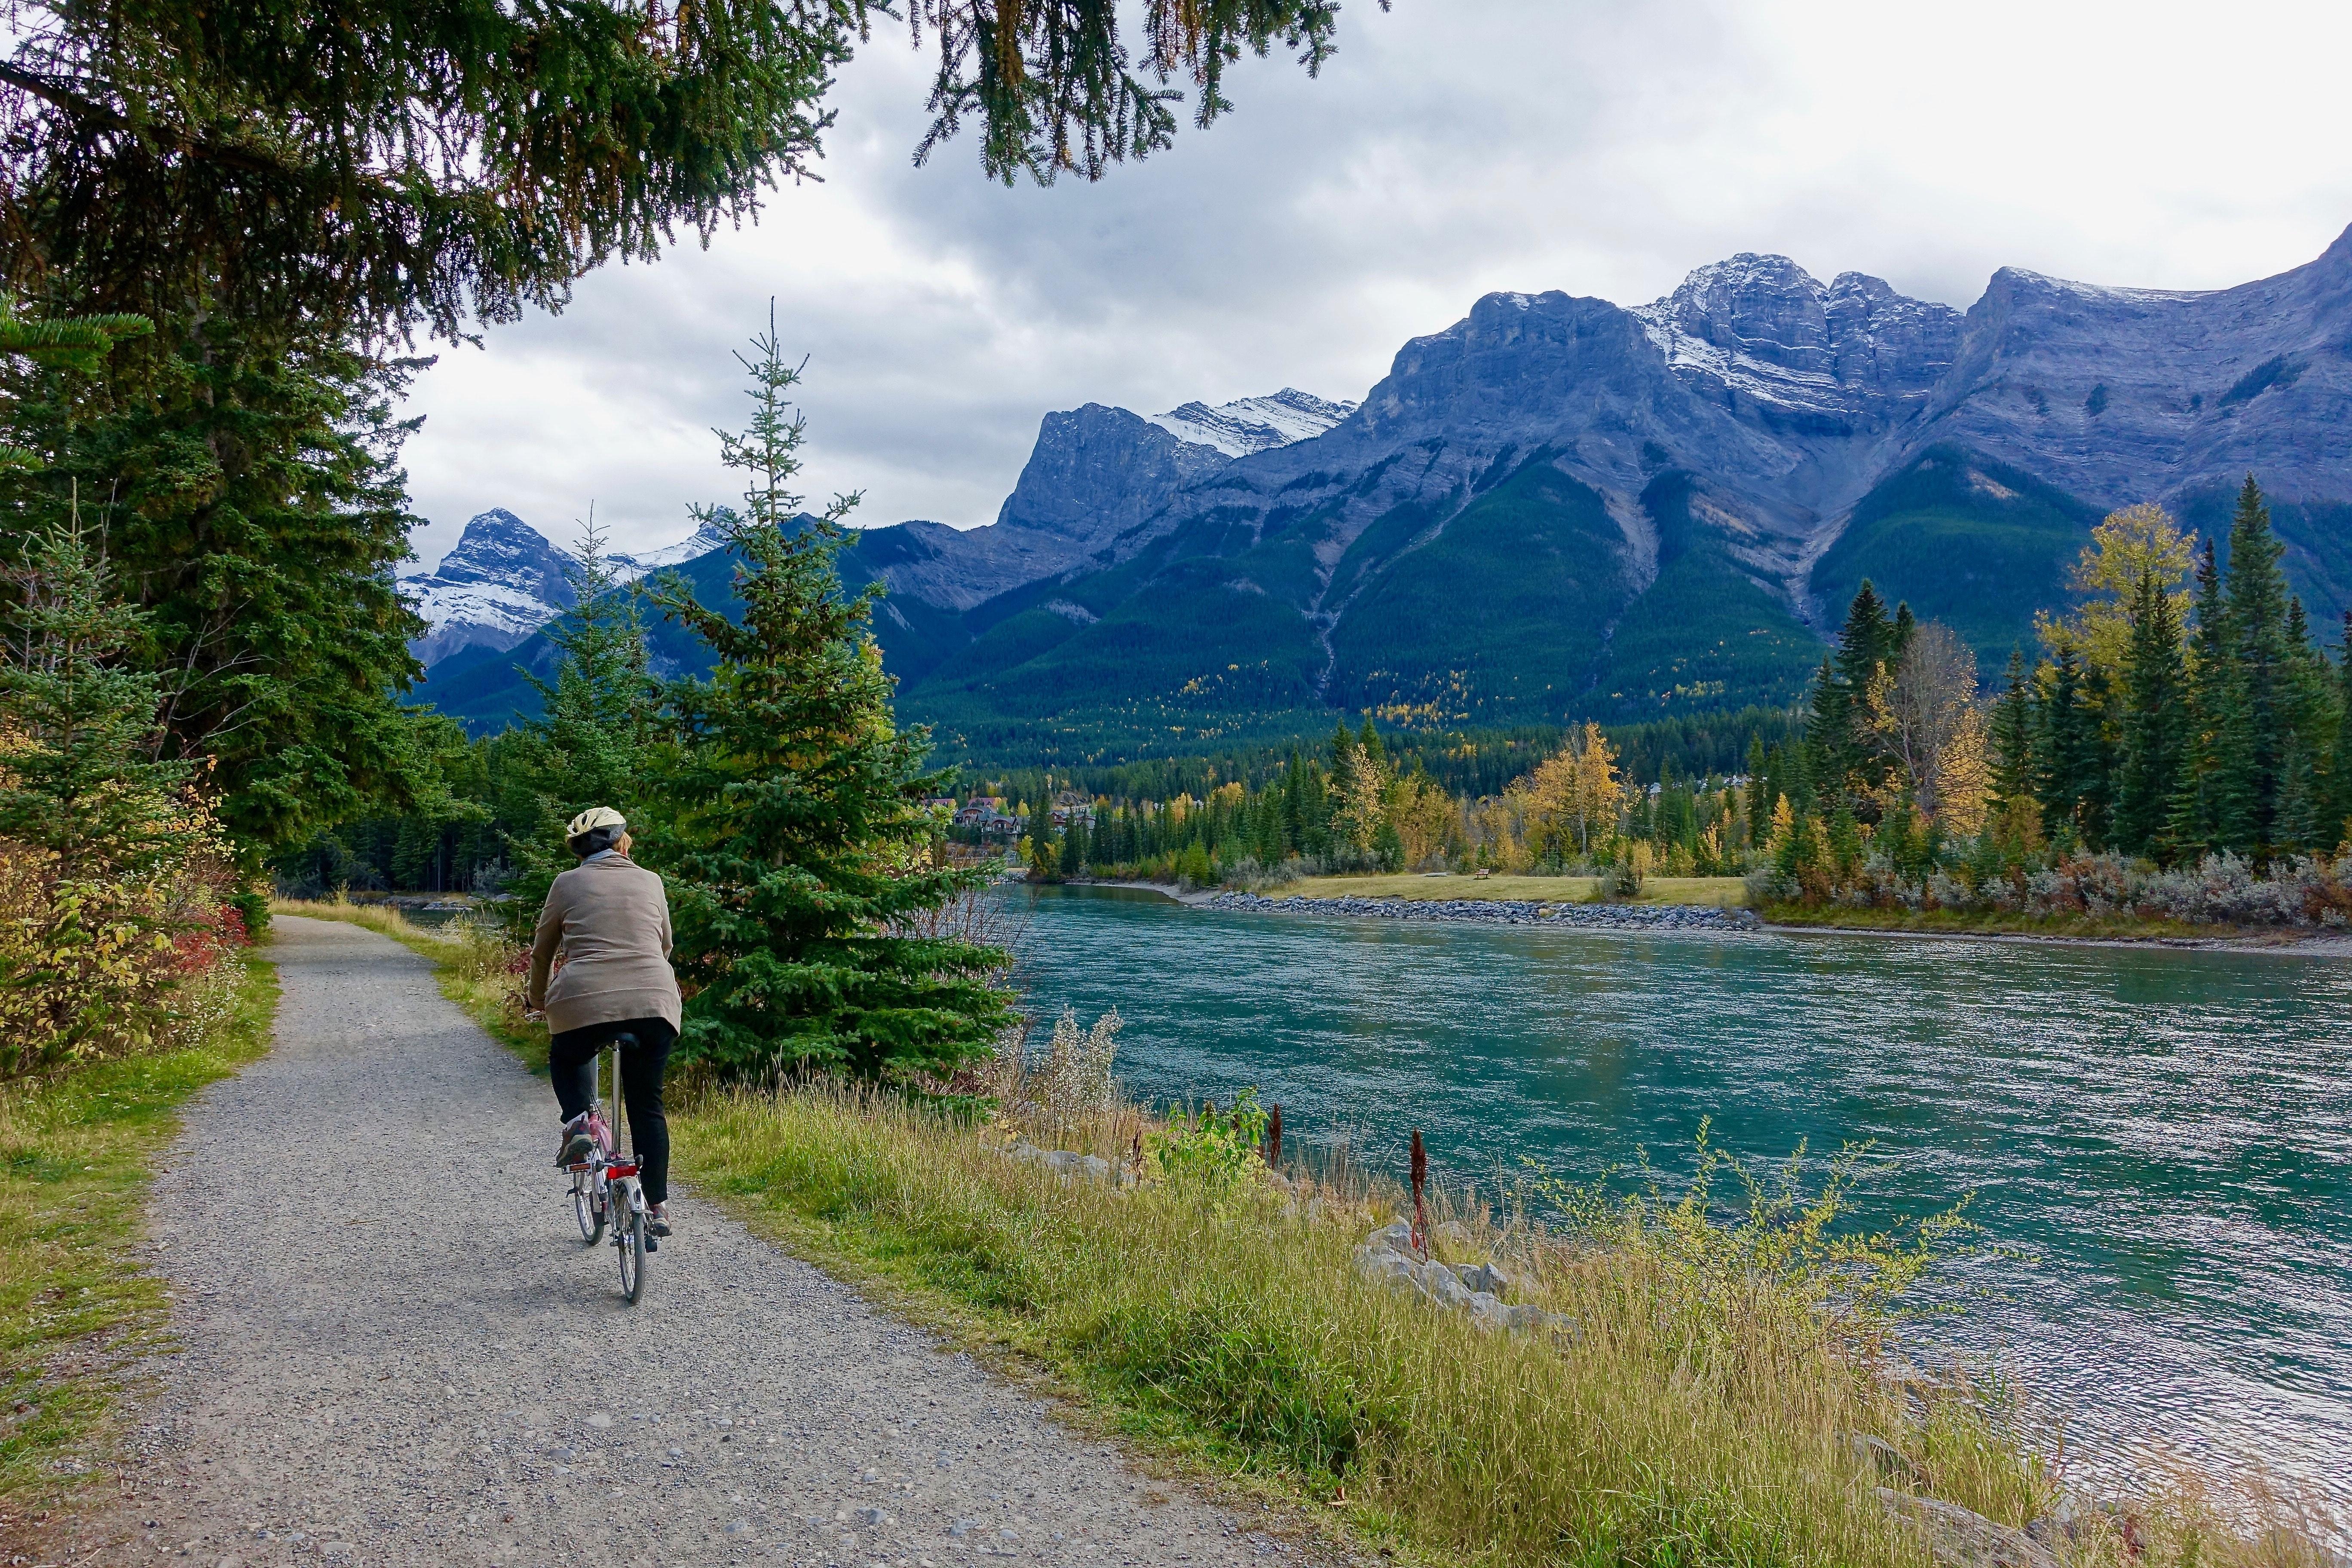 Rear view of woman walking on mountain road photo